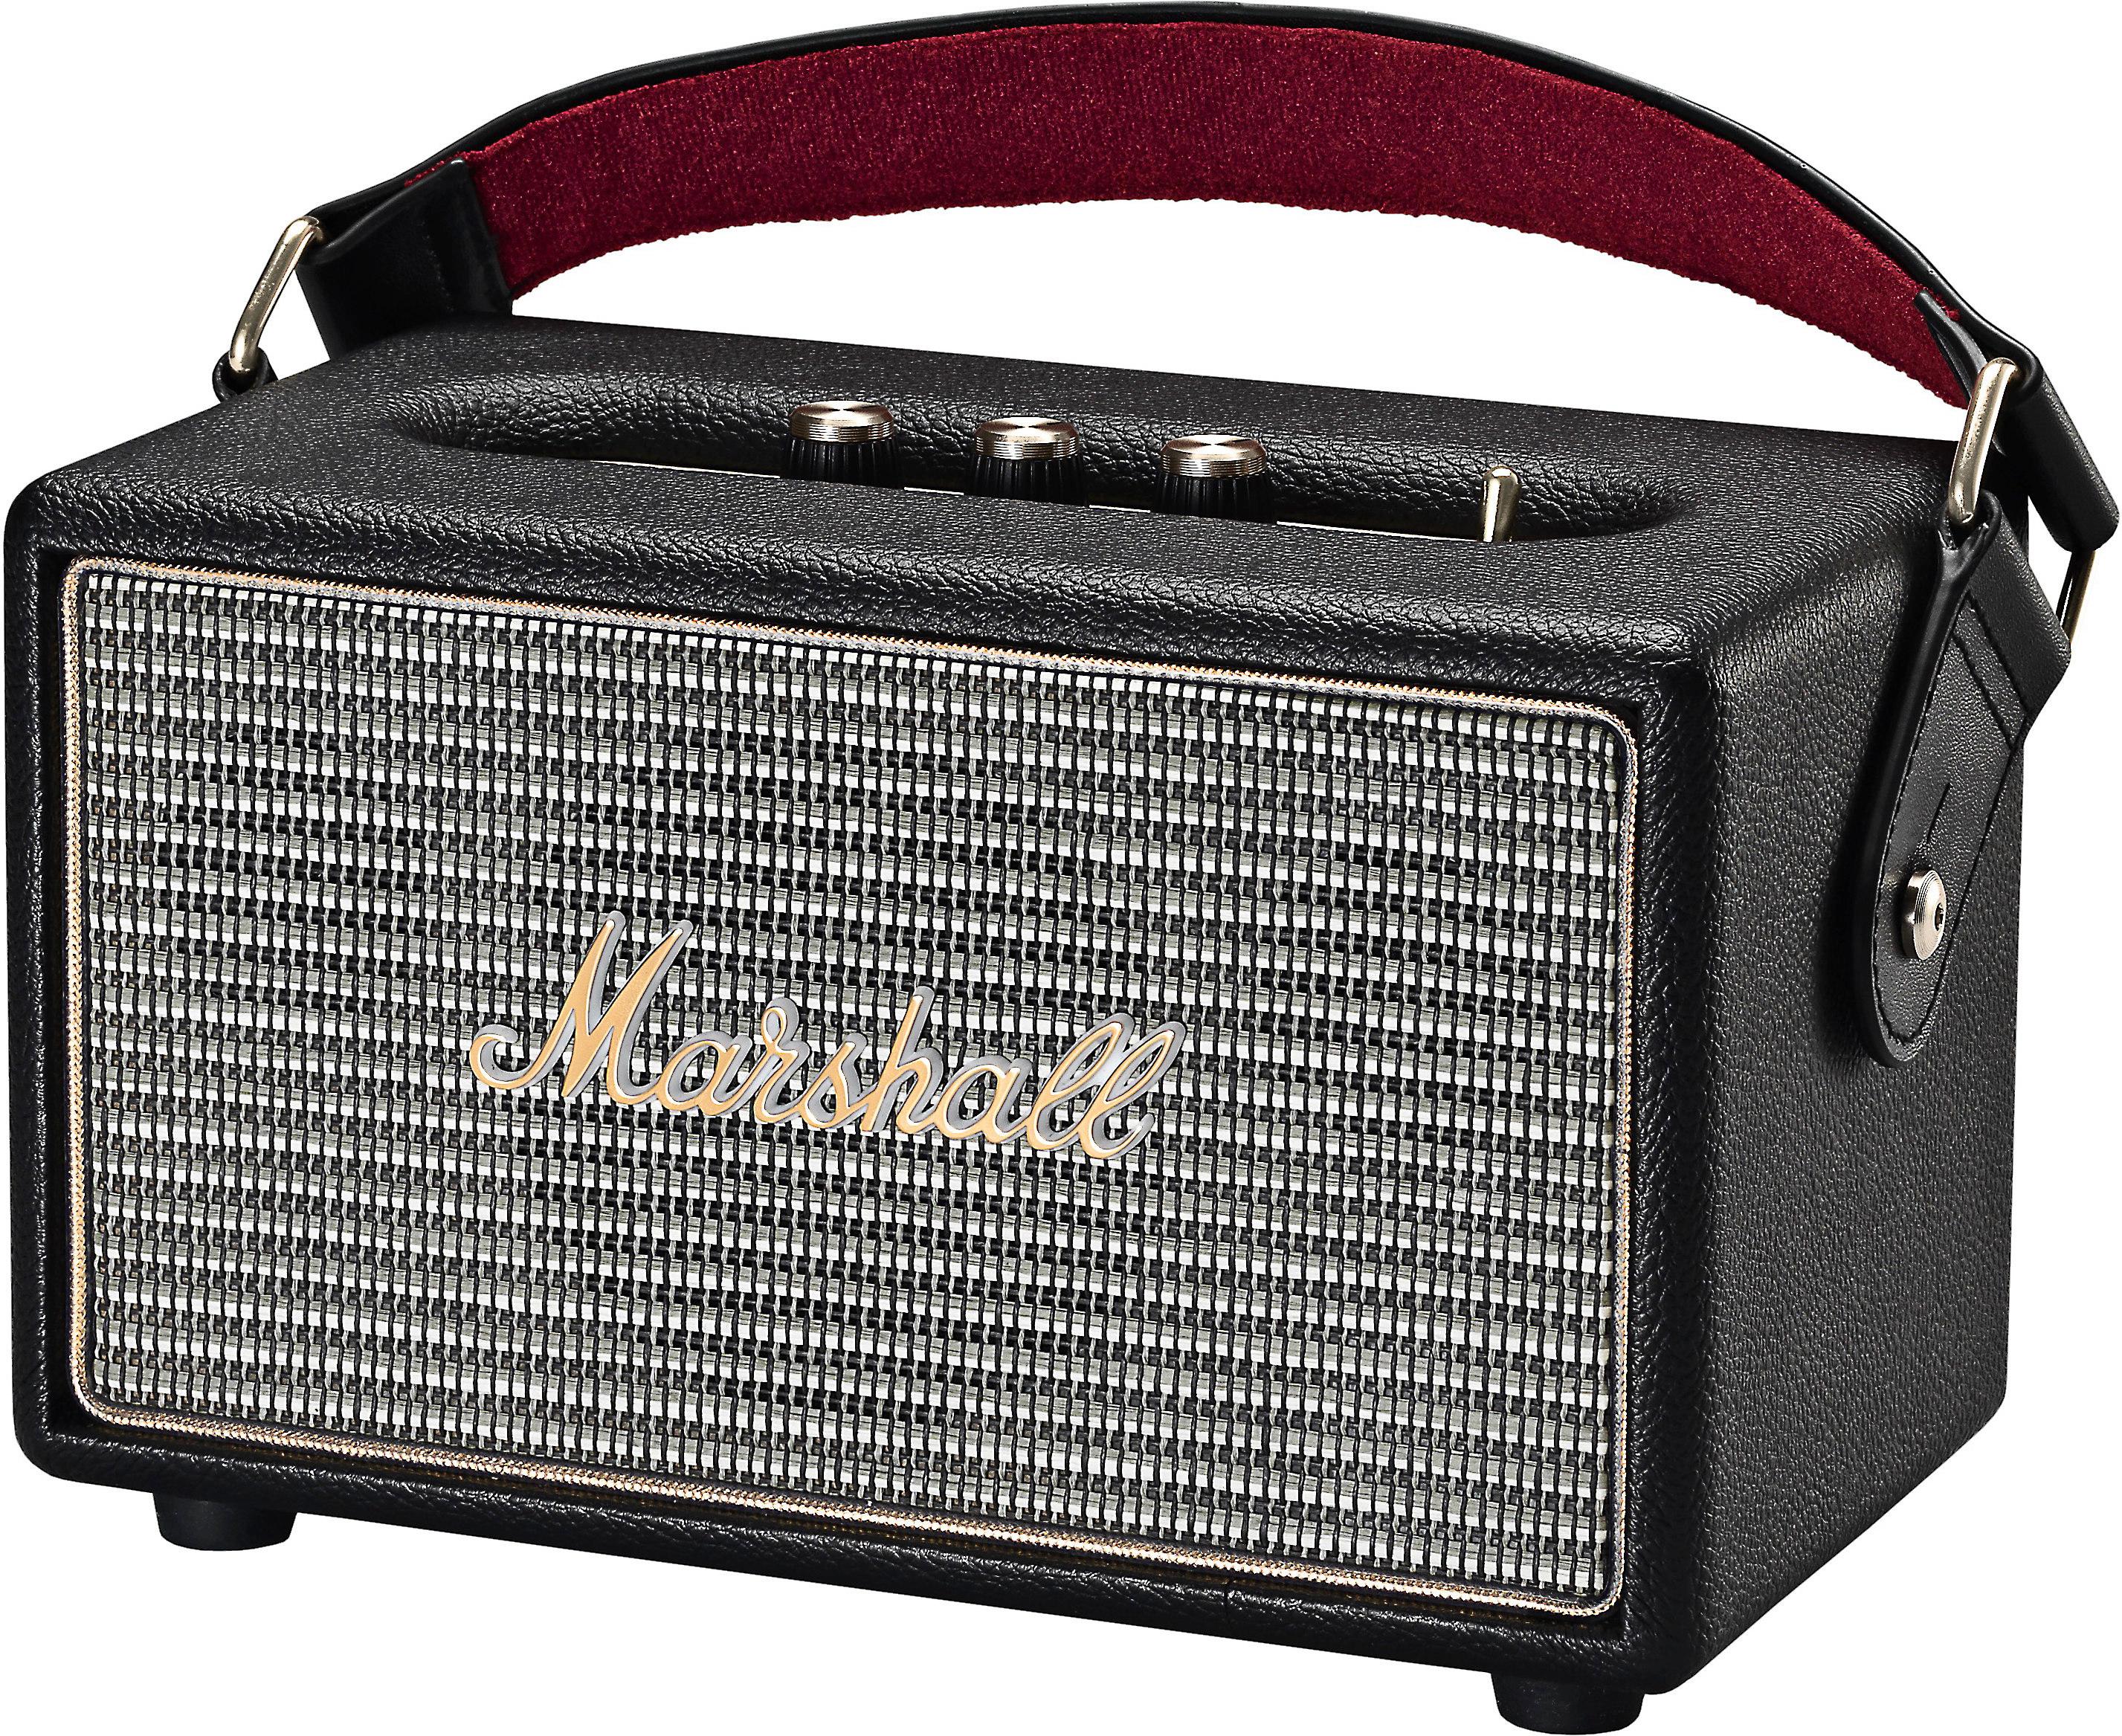 Marshall Kilburn (Black) Portable Bluetooth® speaker at Crutchfield